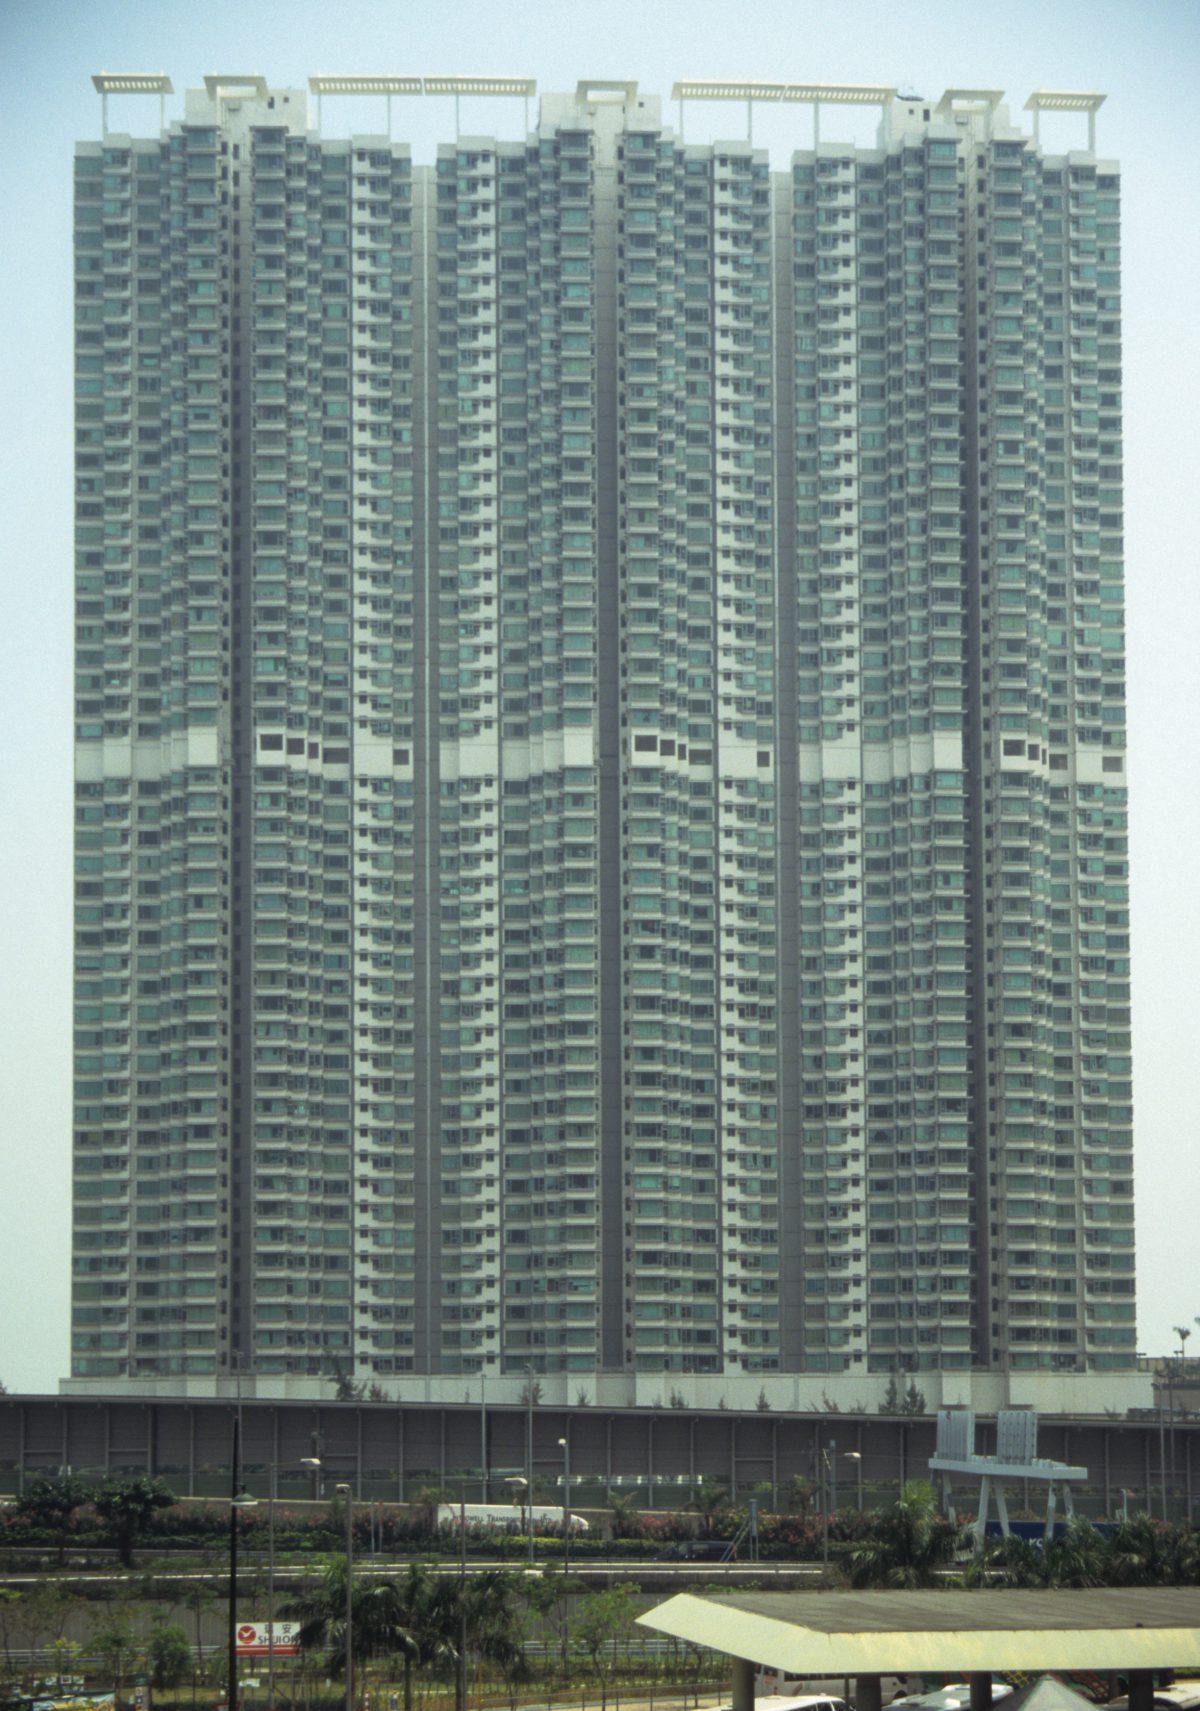 big habitat container - probable 1000+ flats, building